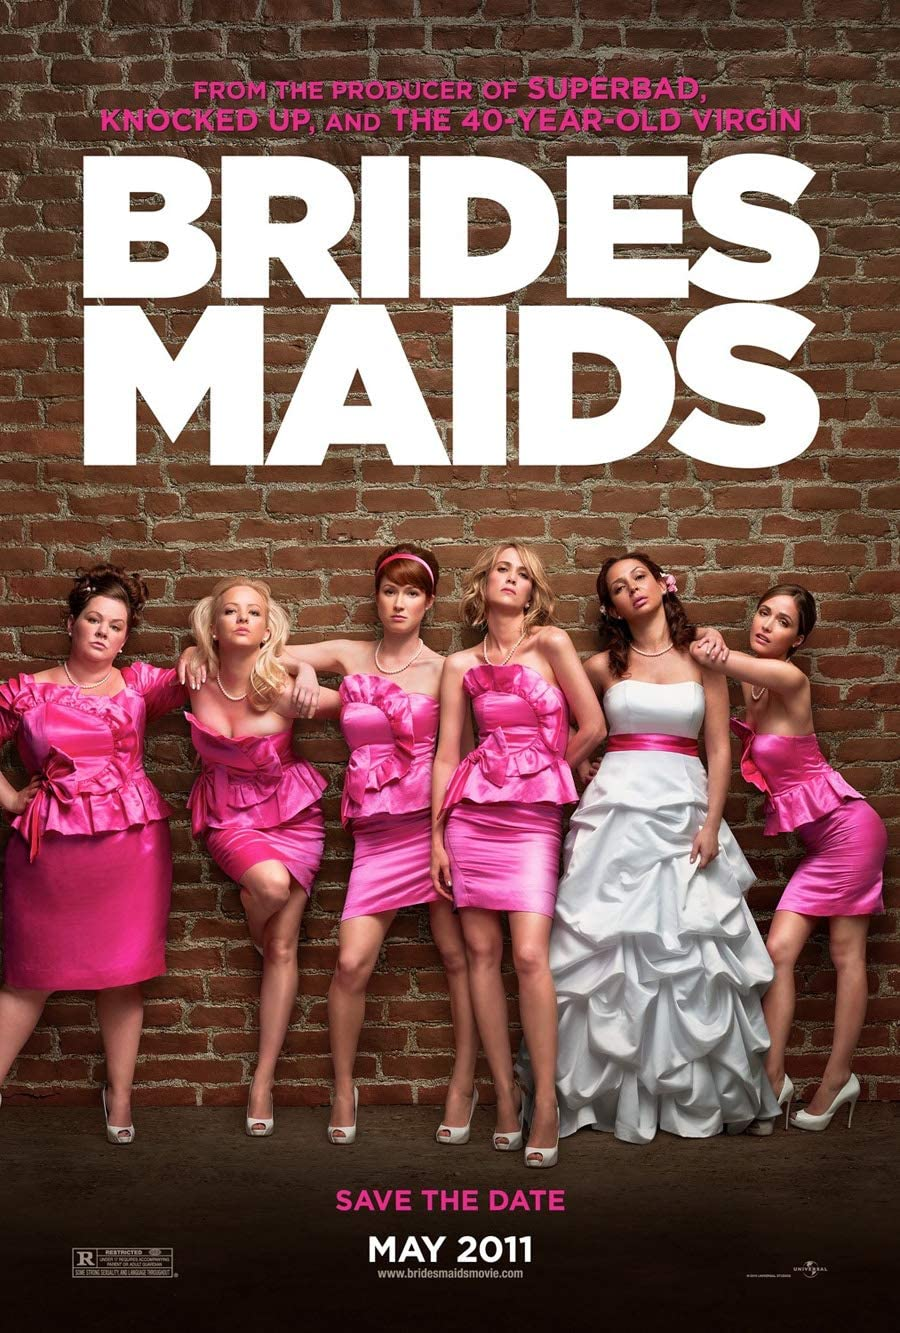 BRIDESMAIDS MOVIE POSTER 2 Sided ORIGINAL Advance 27x40 KRISTIN WIIG MELISSA MCCARTHY